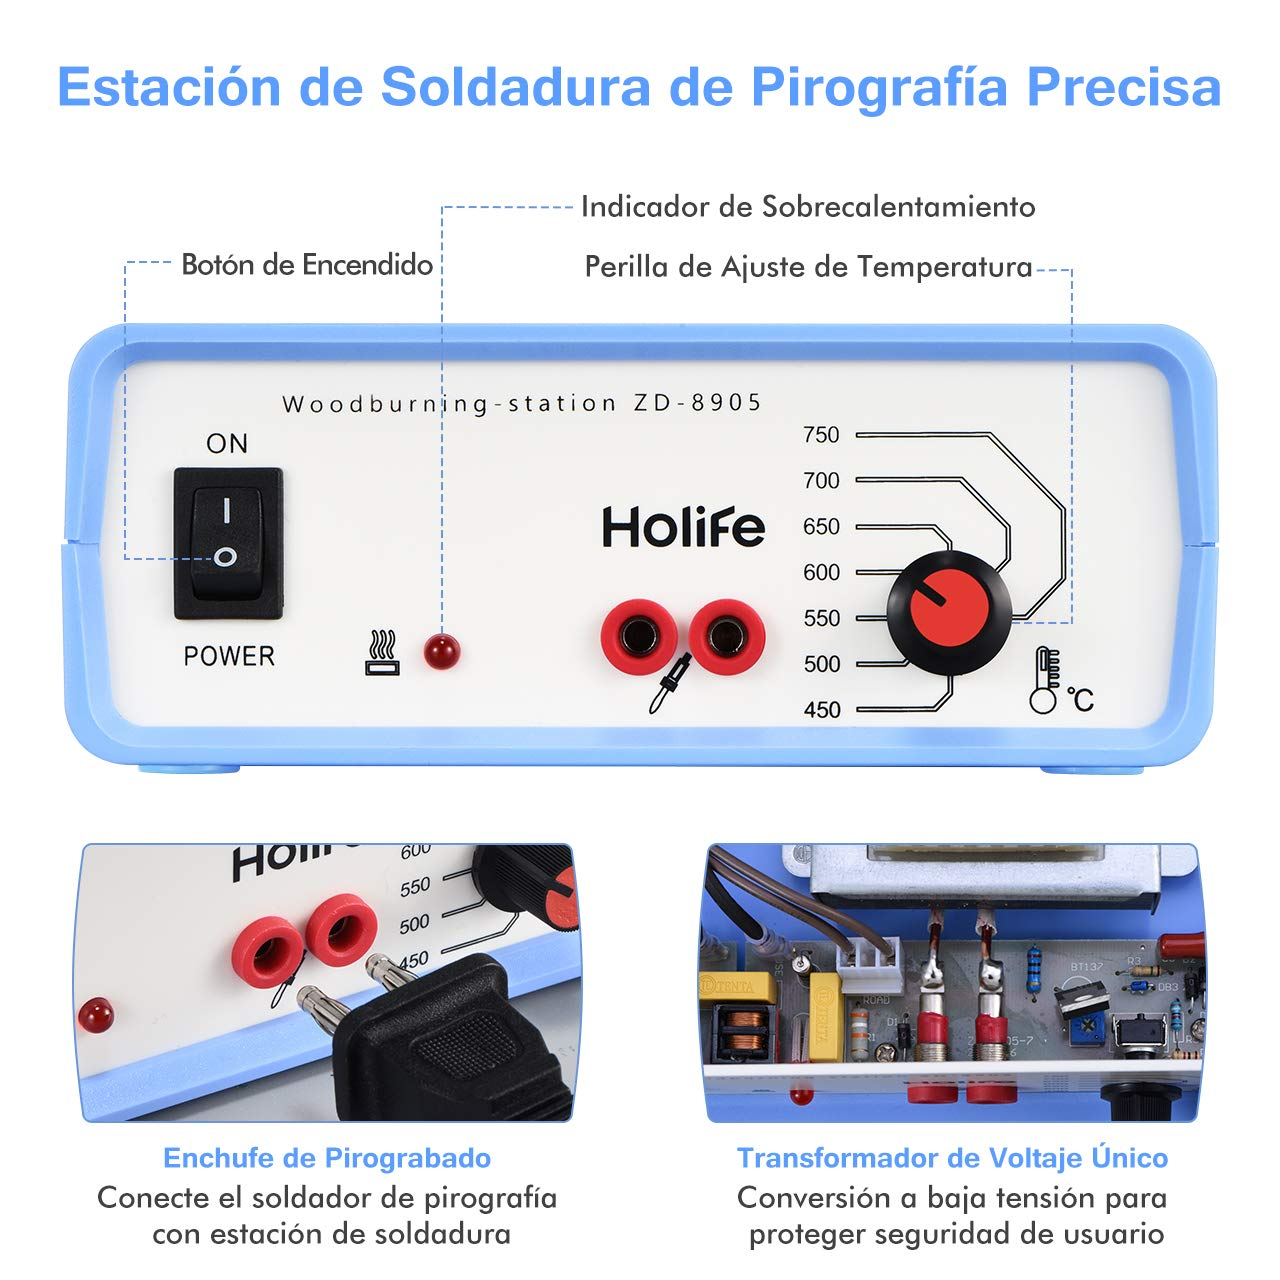 Kit de Pirograbador de Madera, Holife Estación Pirograbada, 40W/220 V con [4 Tornillos+ 3 Puntas de Pirograbada + Soporte], Soldador Pirografo Electrico ...